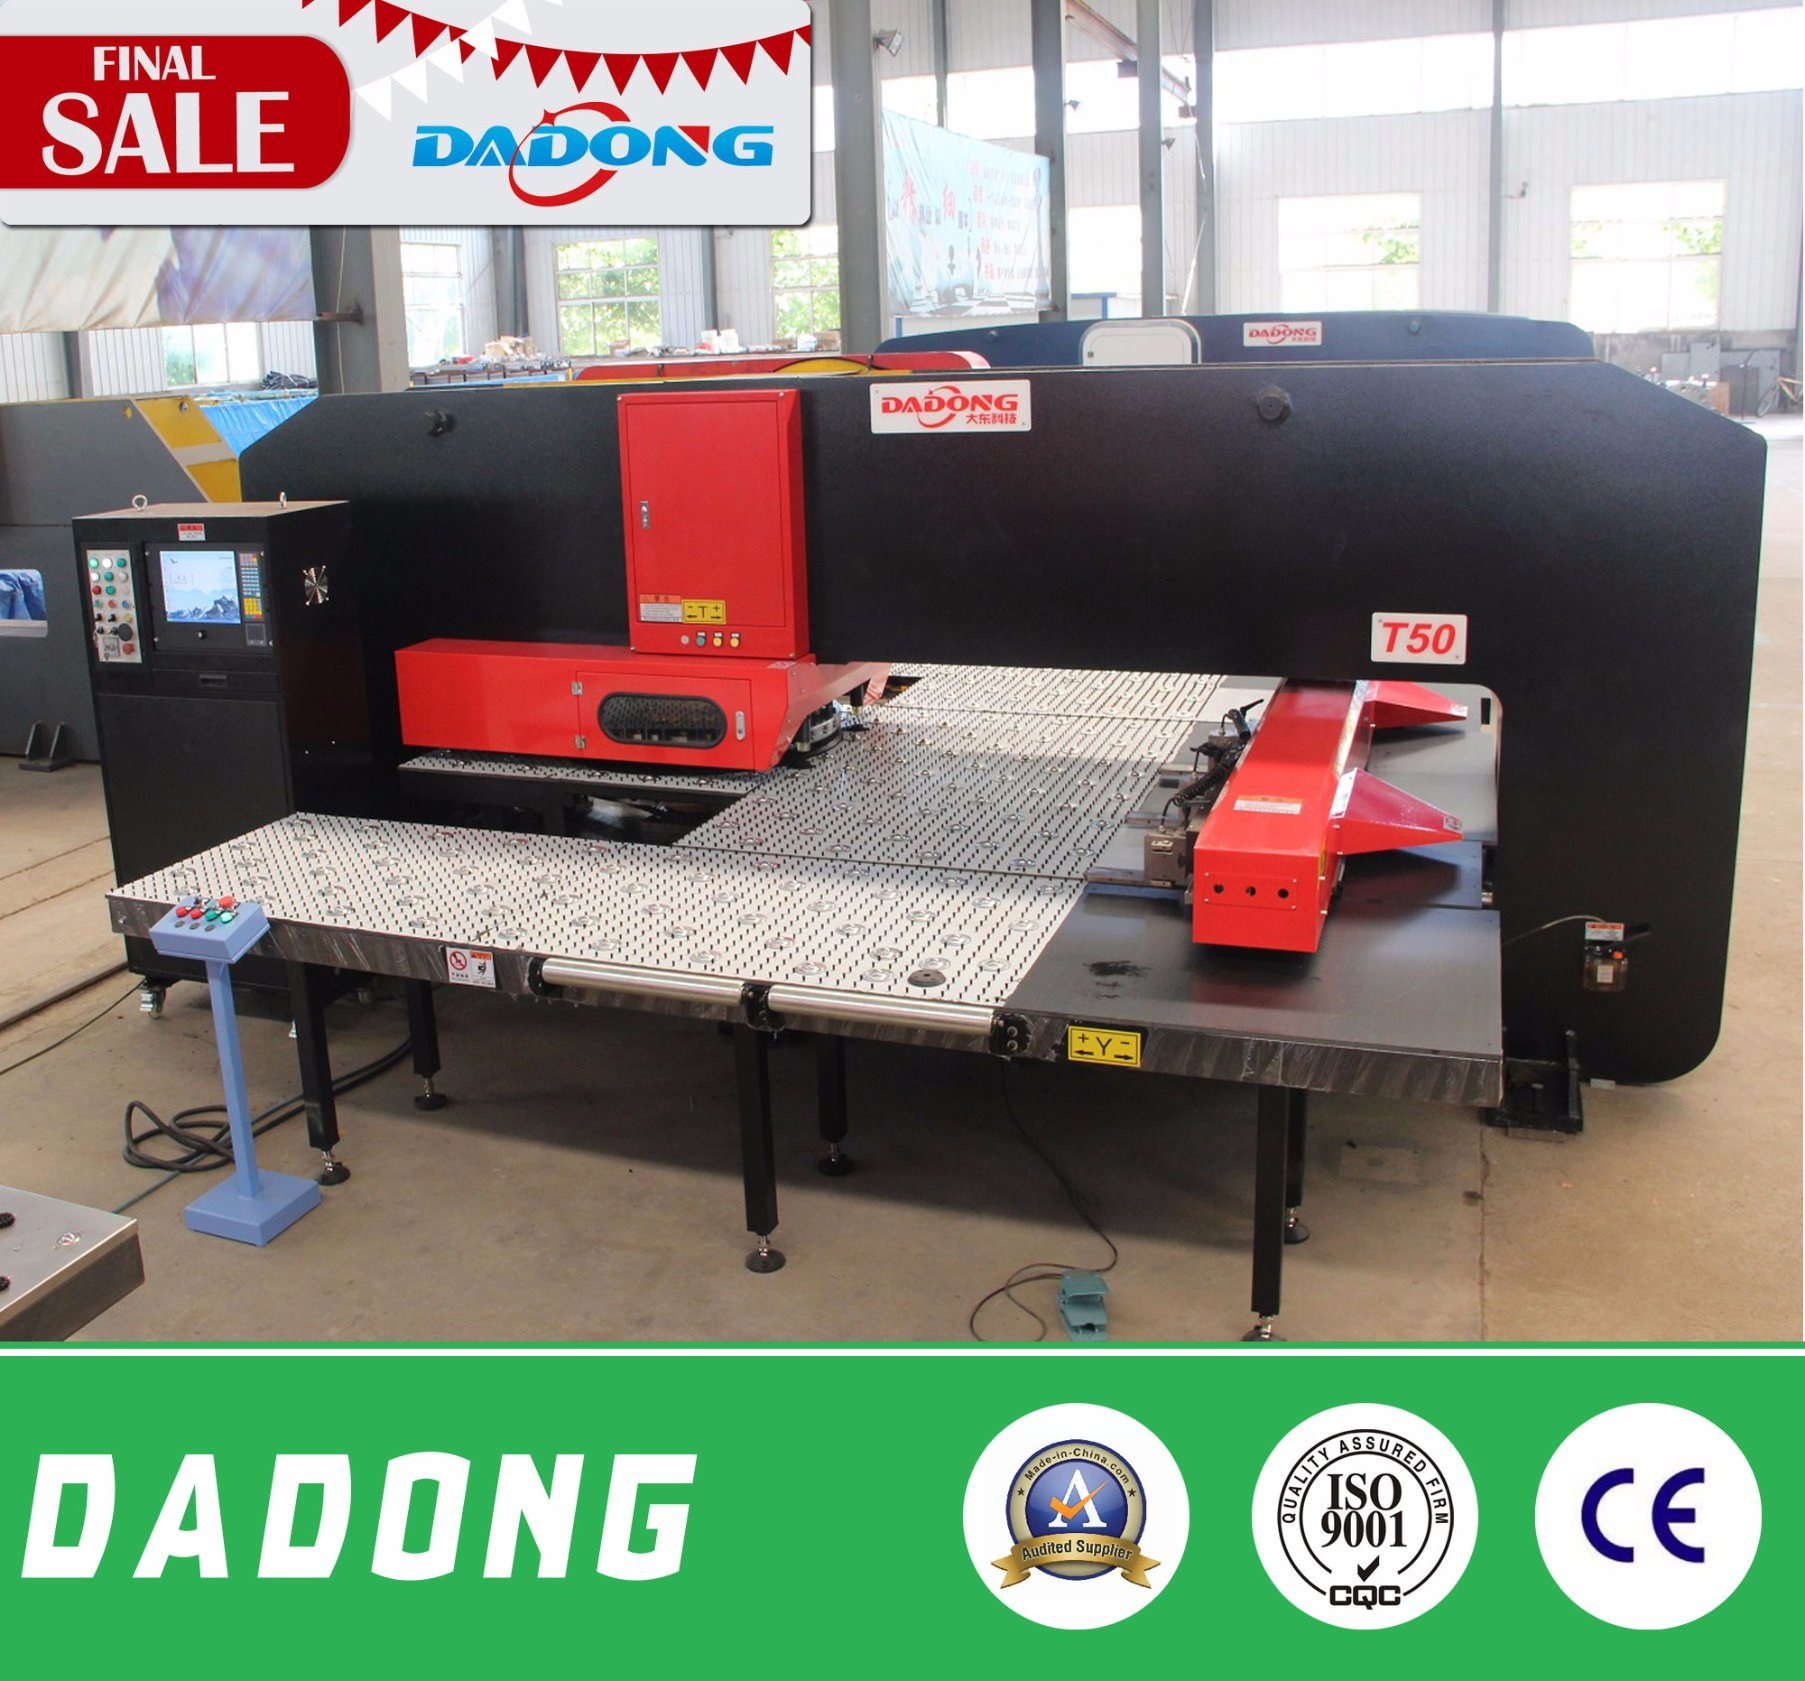 T50 CNC Turret Punching Machine for Heavy Duty Punching Machine